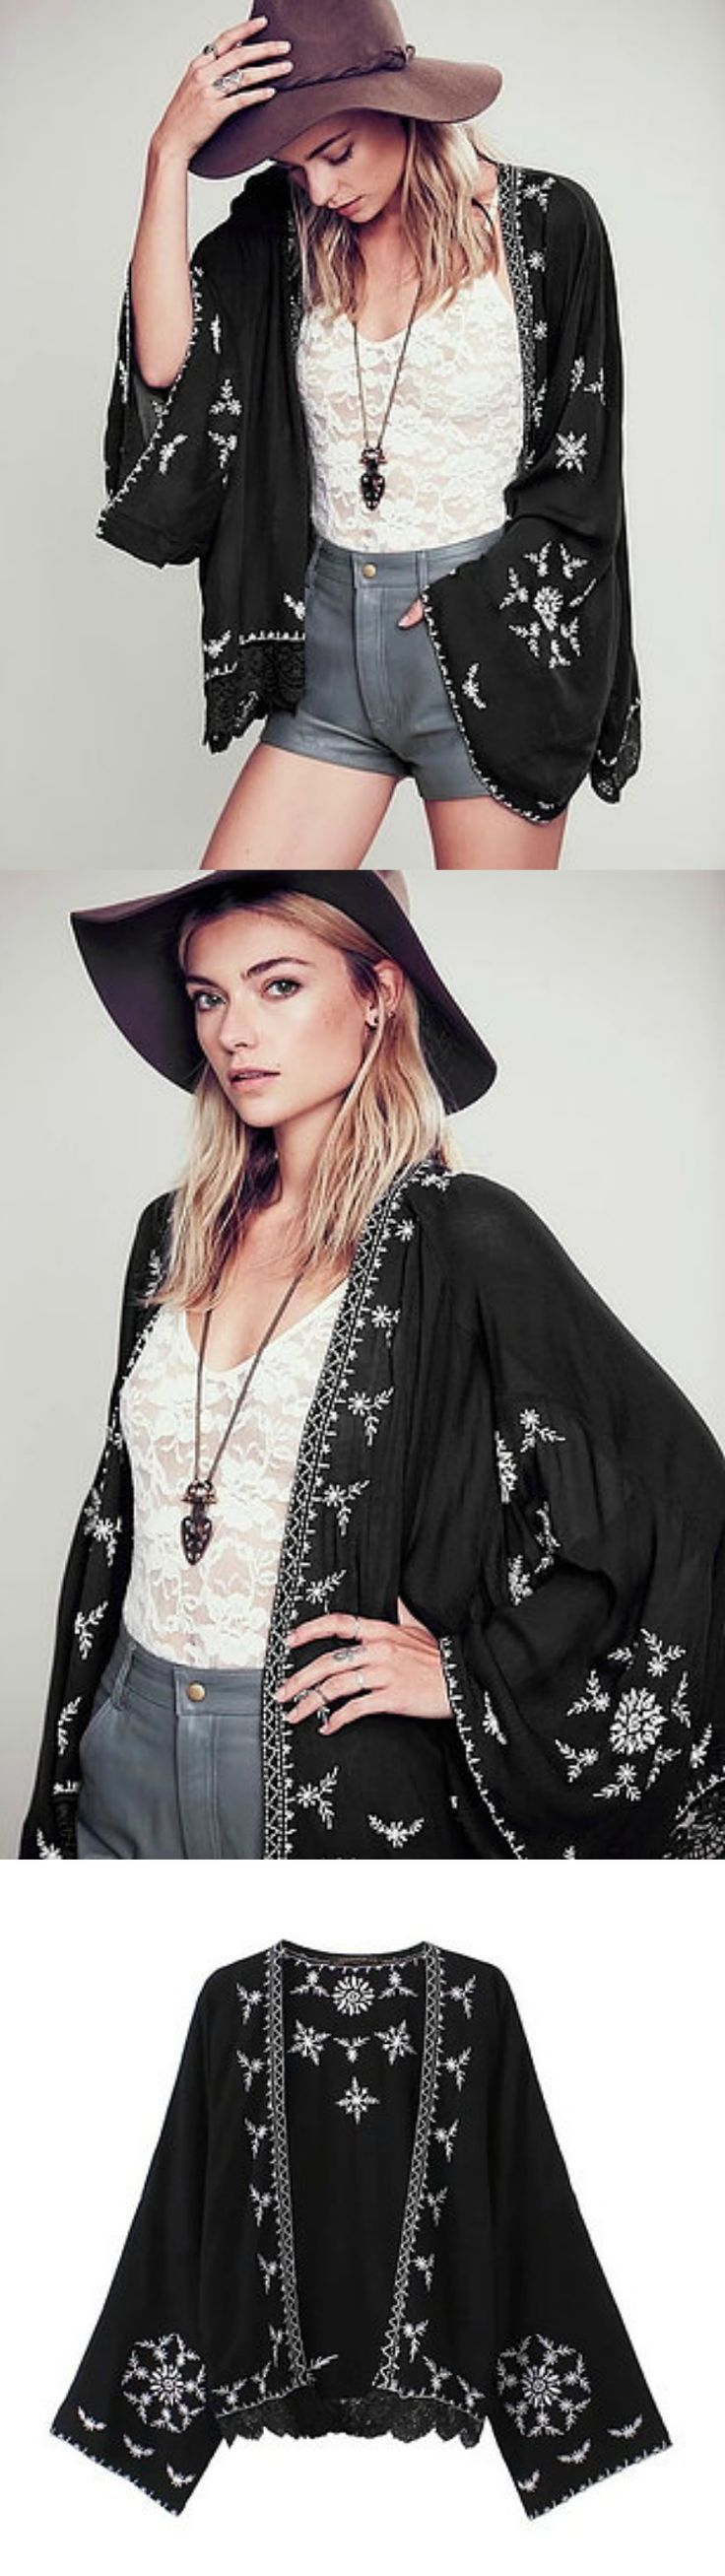 Black Kimono Cardigan is Available @ PASABOHO ( Free Shipping Worldwide ) ❤️ boho fashion :: gypsy style :: hippie chic :: boho chic :: outfit ideas :: boho clothing :: free spirit :: fashion trend :: embroidered :: flowers :: floral :: lace :: summer :: love :: street style :: fashion style :: boho style :: bohemian :: modern vintage :: ethnic tribal :: embroidery dress :: jacket :: skirt :: Coachella :: festival outfit